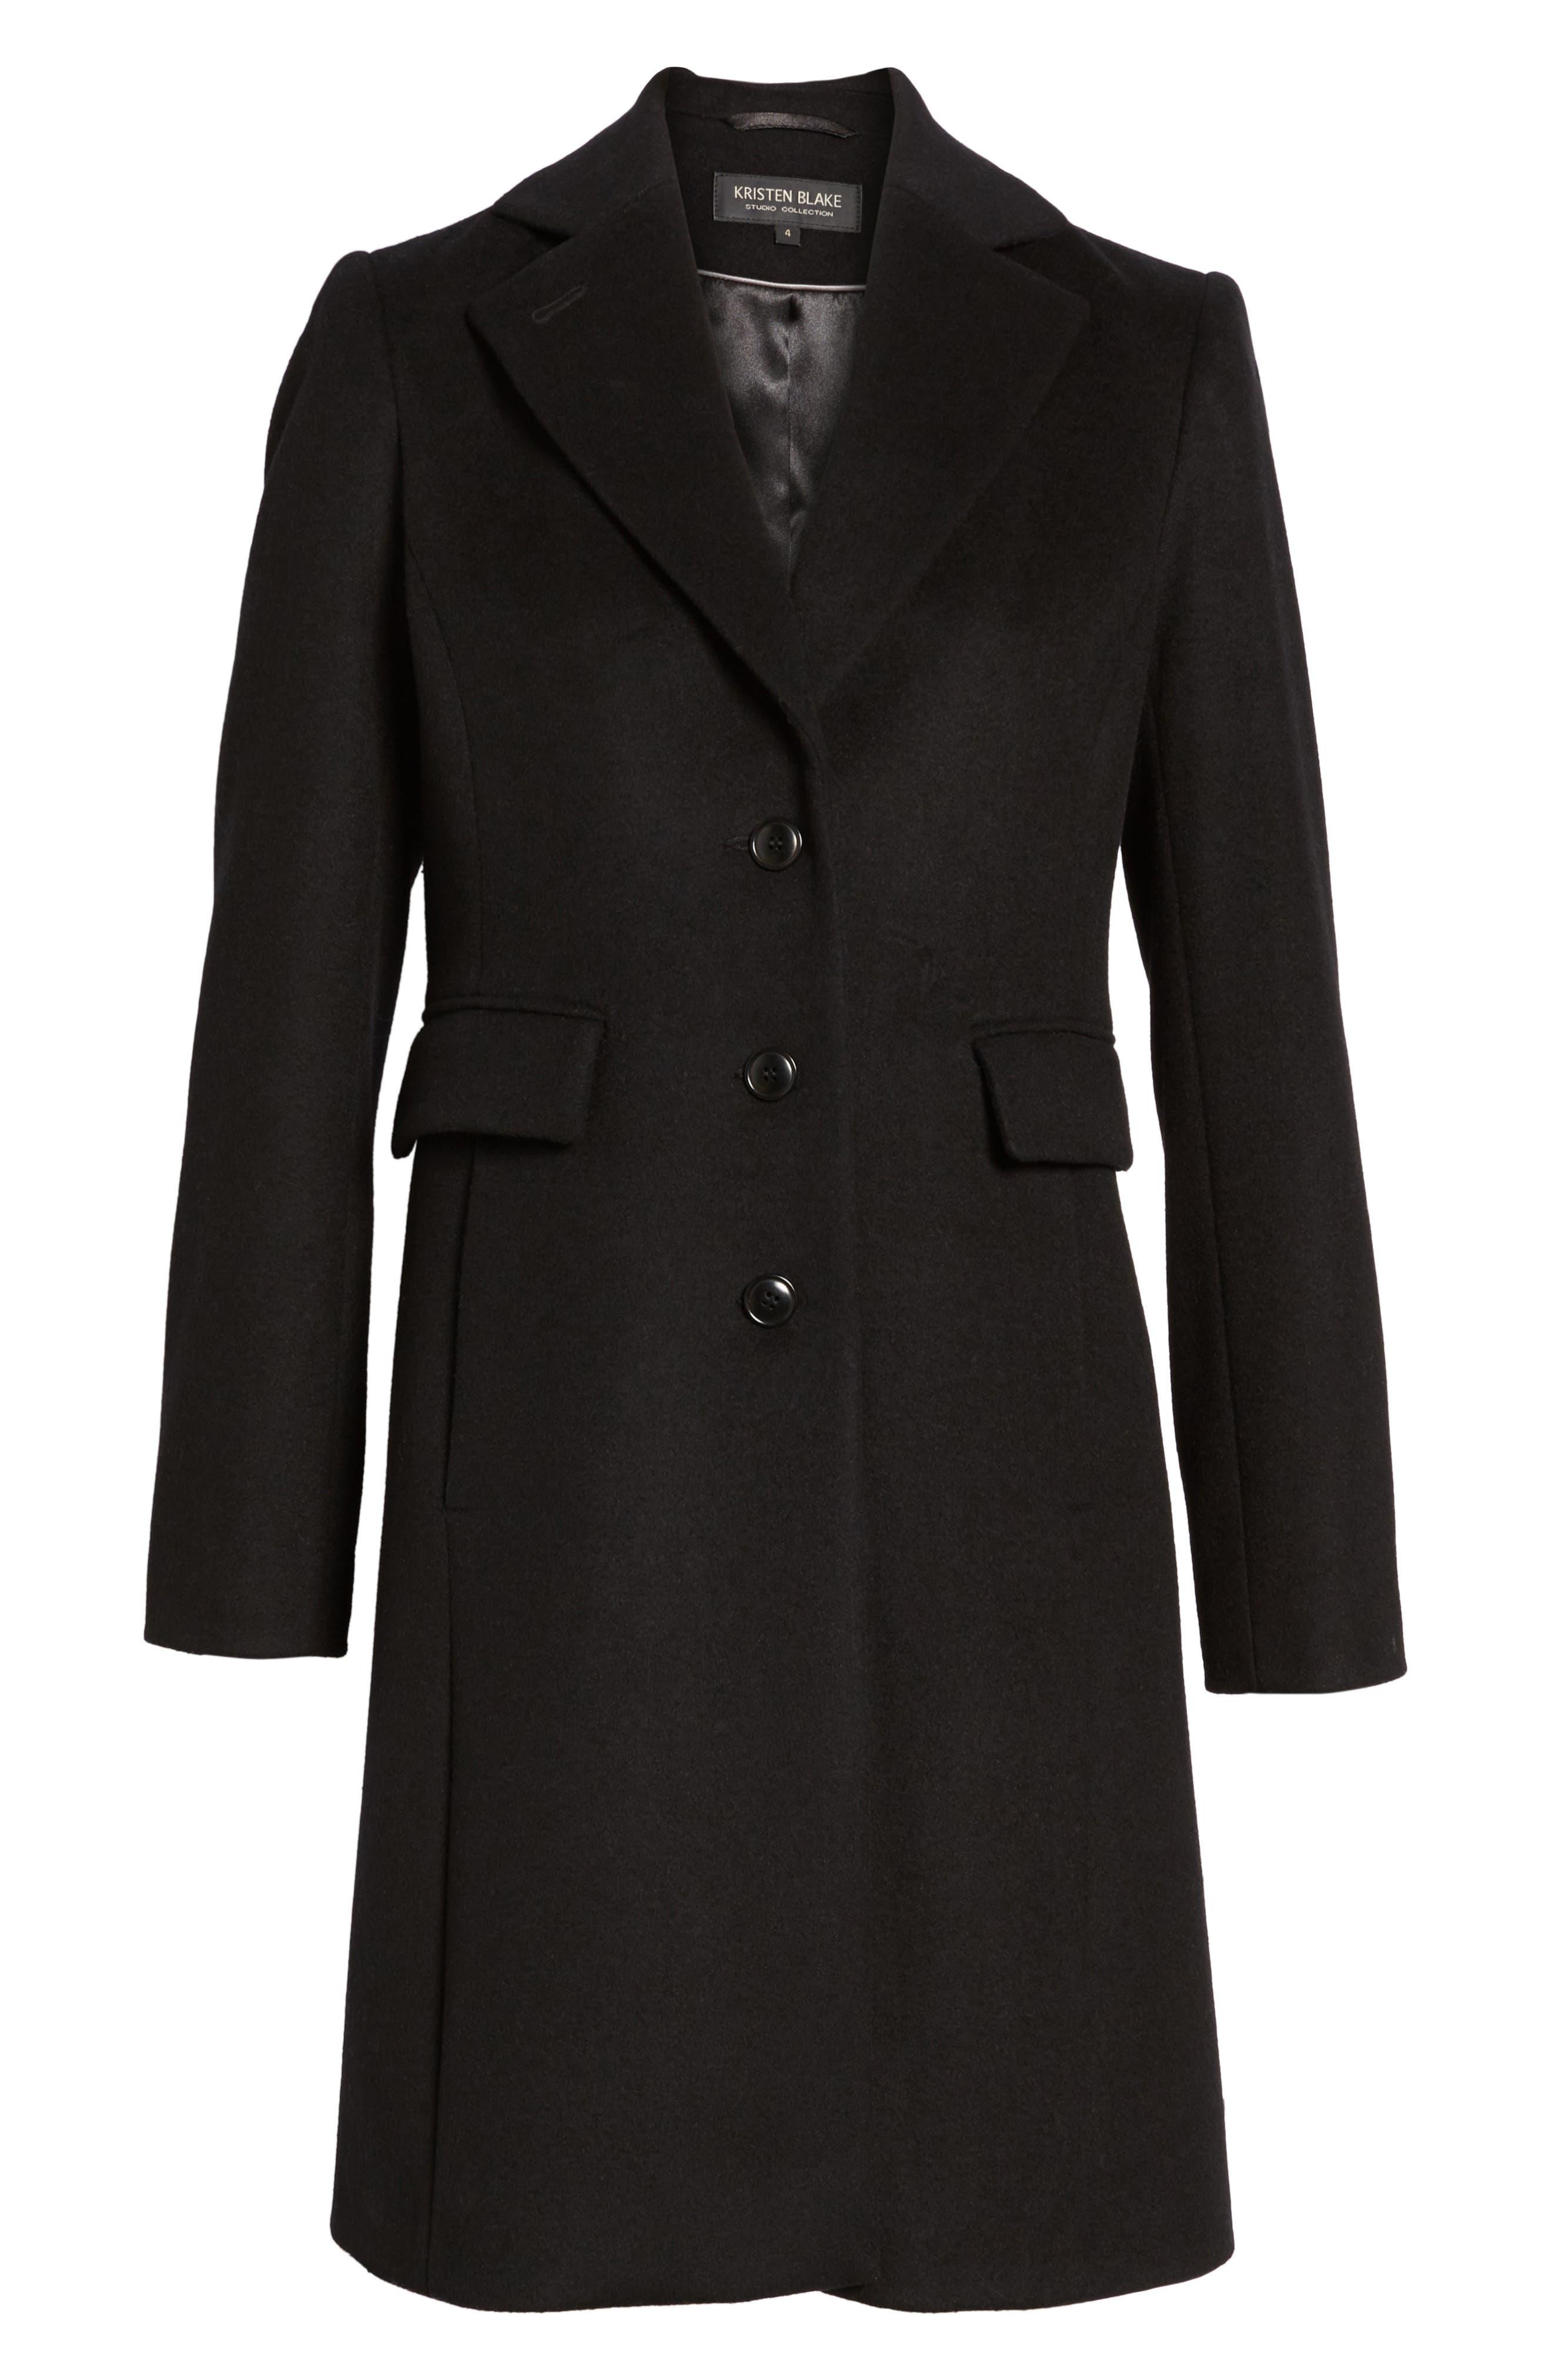 Walking Coat,                             Alternate thumbnail 7, color,                             Black